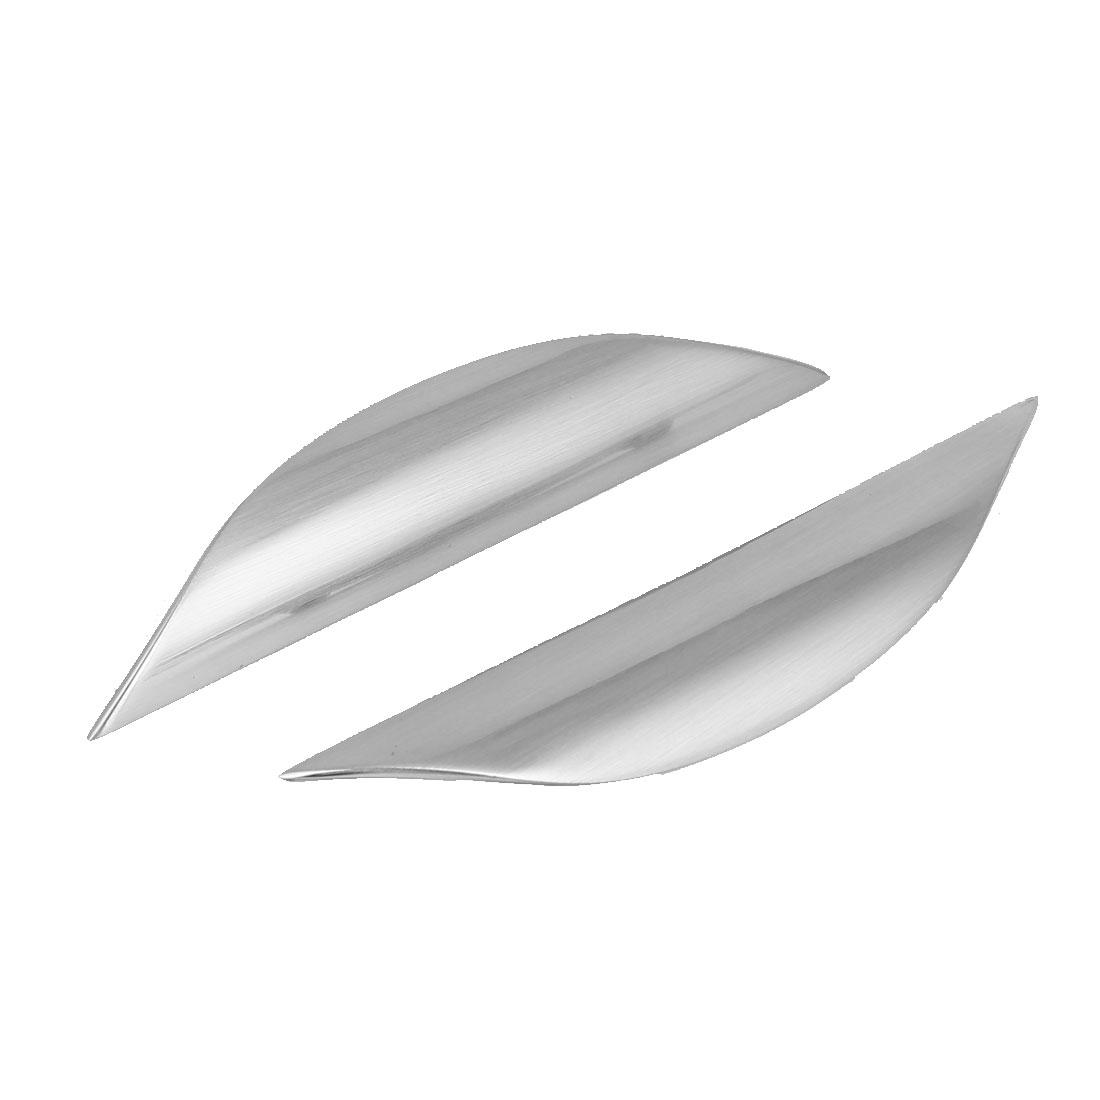 Drawer Cabinet Closet Zinc Alloy Pull Handle Grip Silver Tone 129mm Long 2pcs